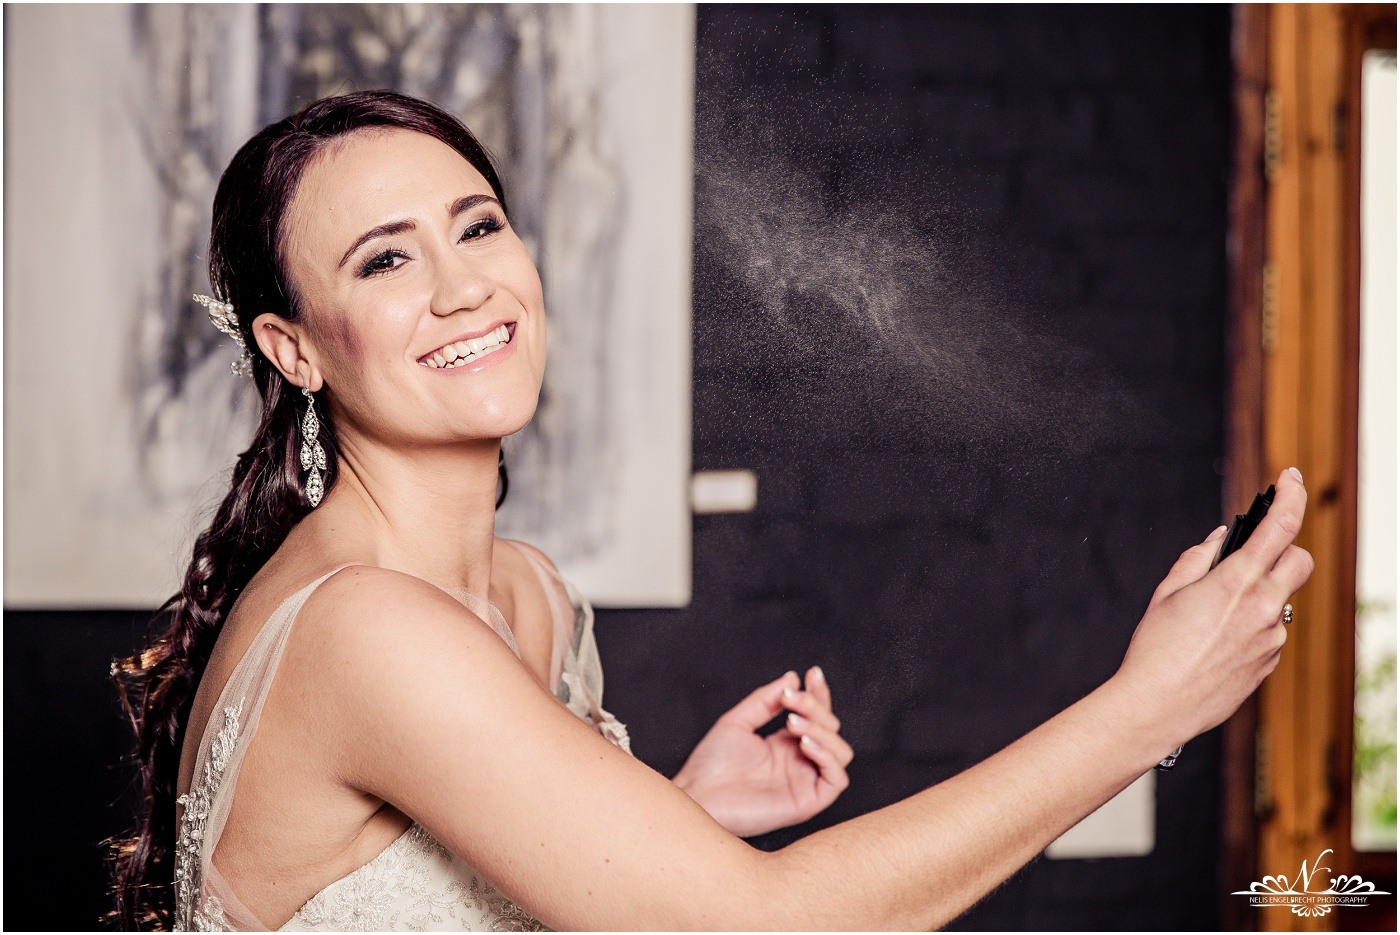 Eensgezind-Wedding-Photos-Nelis-Engelbrecht-Photography-036